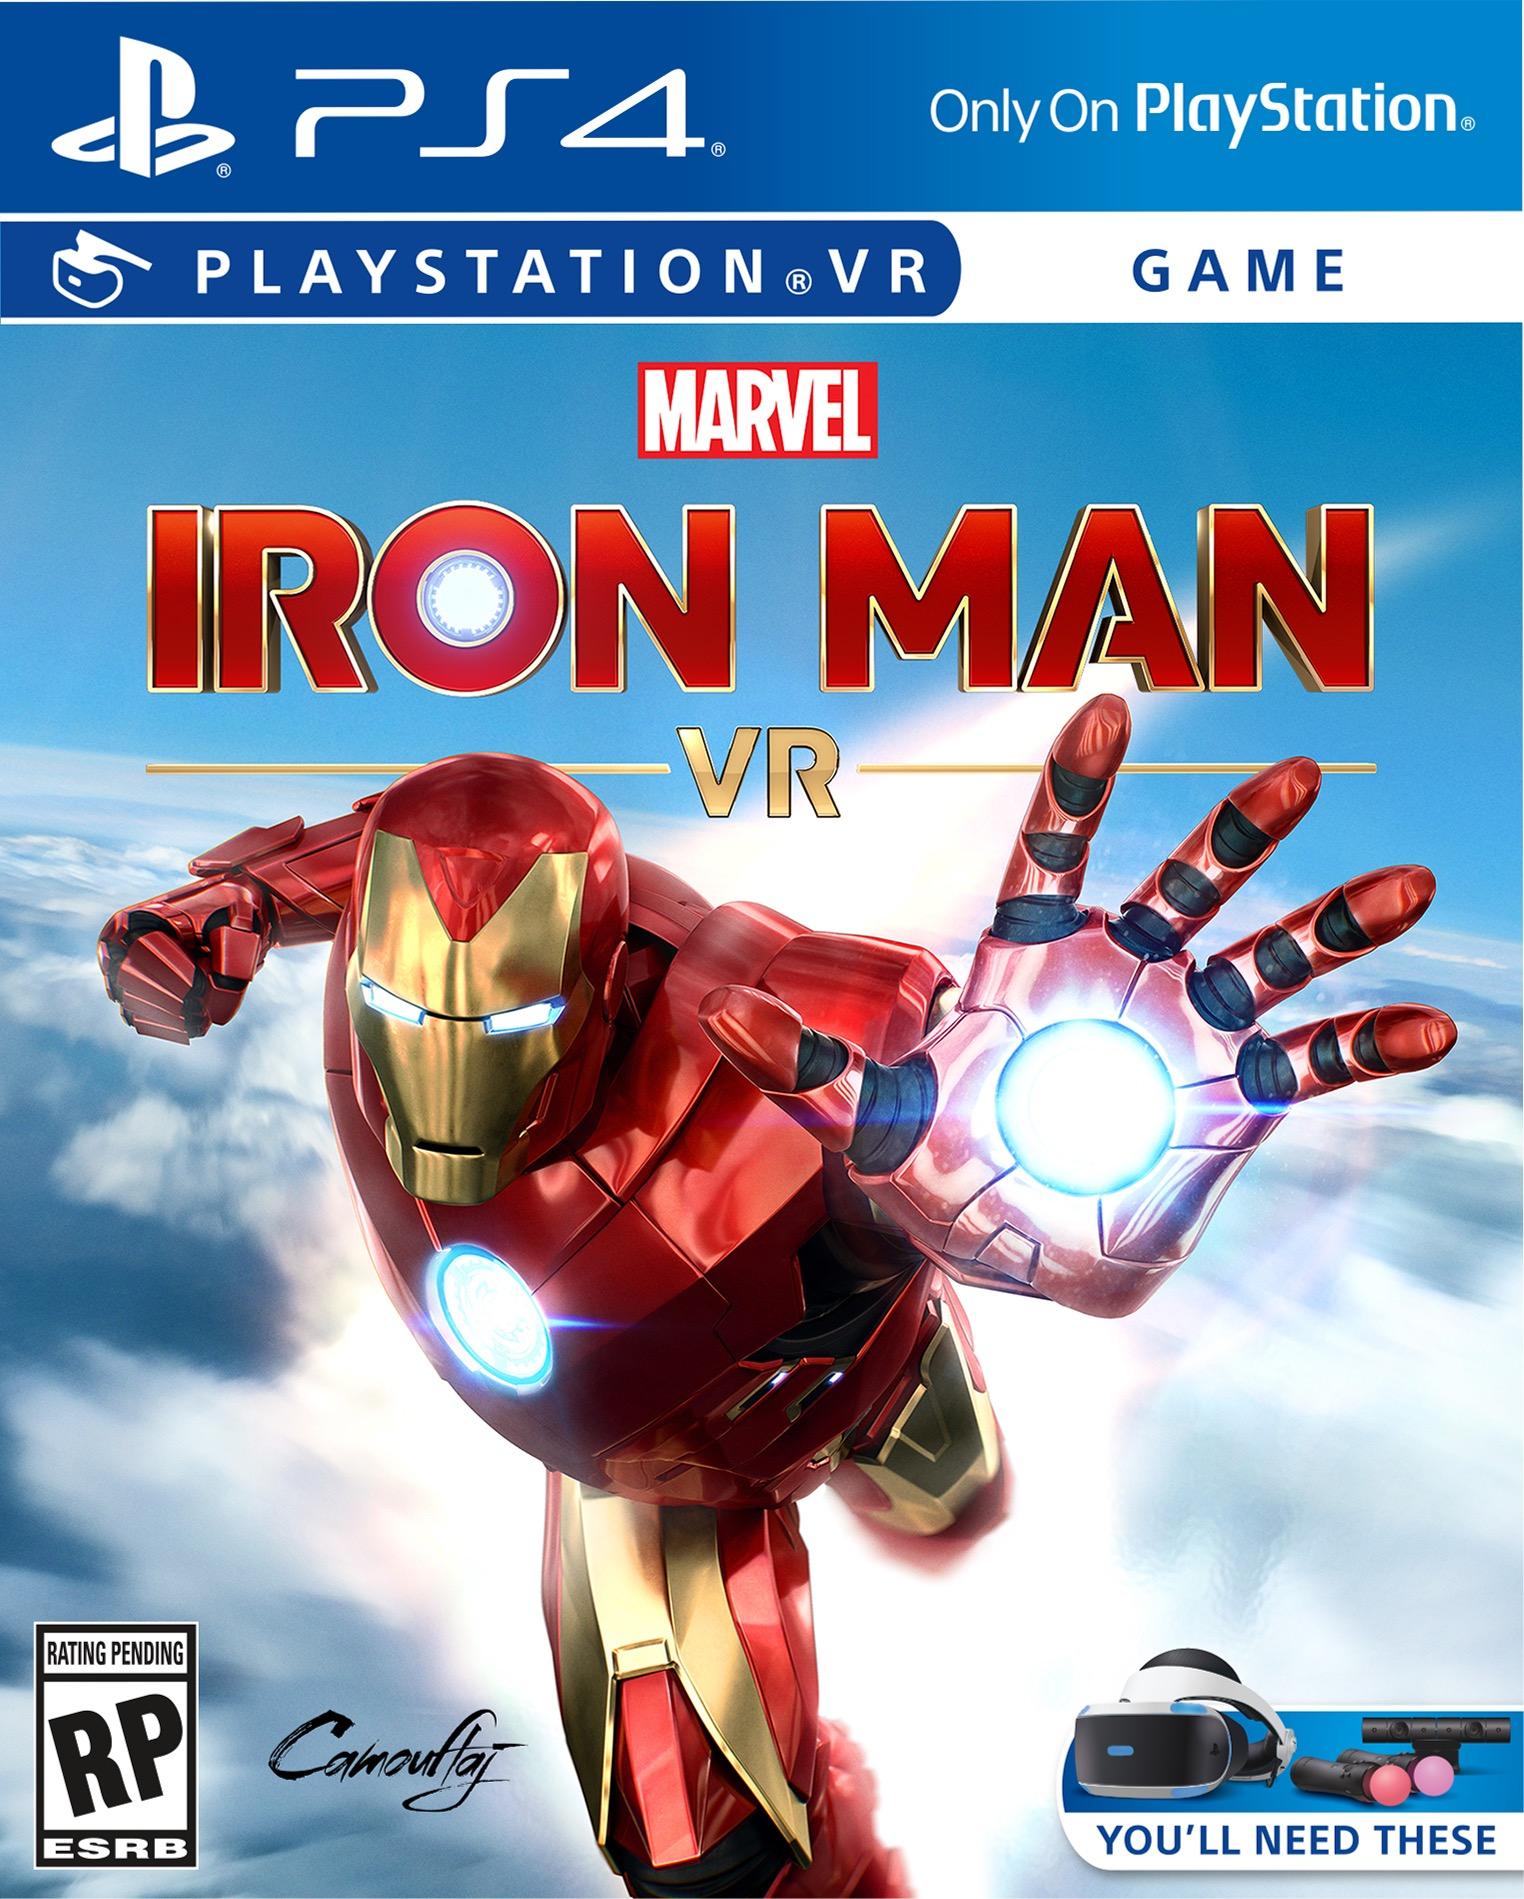 Marvel's Iron Man VR Arrives 2019 on PlayStation VR